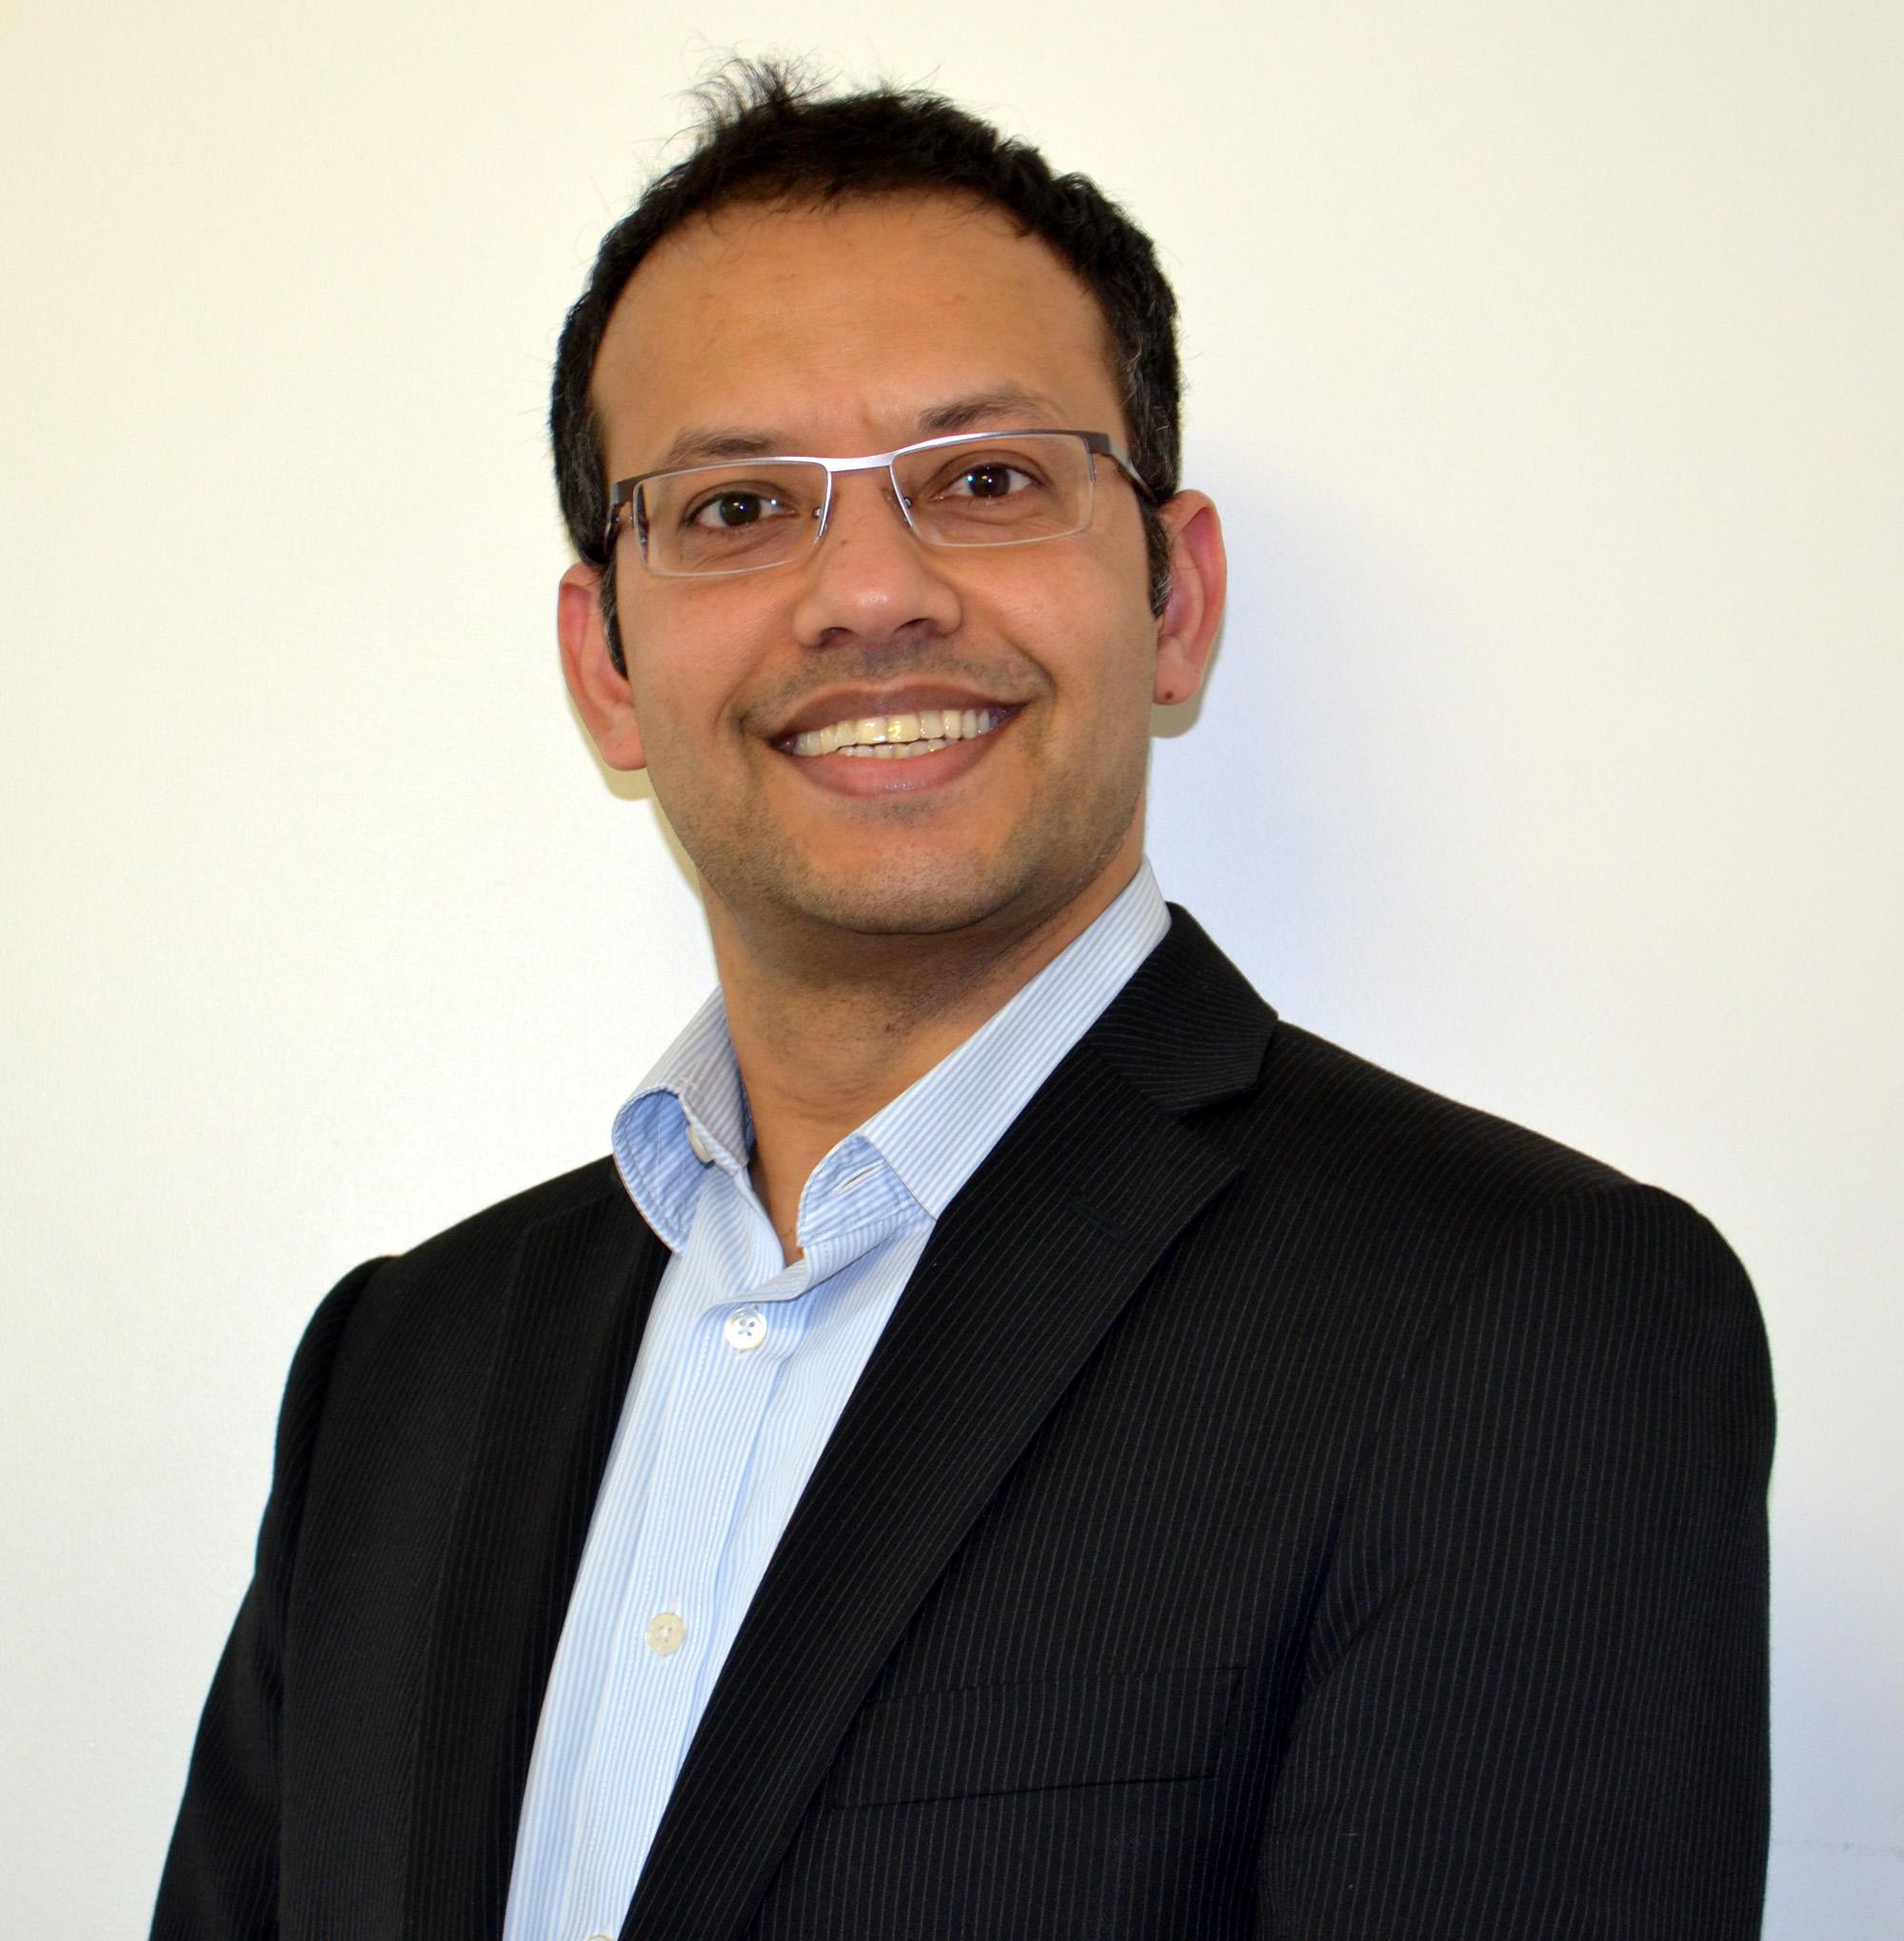 Shalom Srirangam - Consultant Uroogical Surgeon